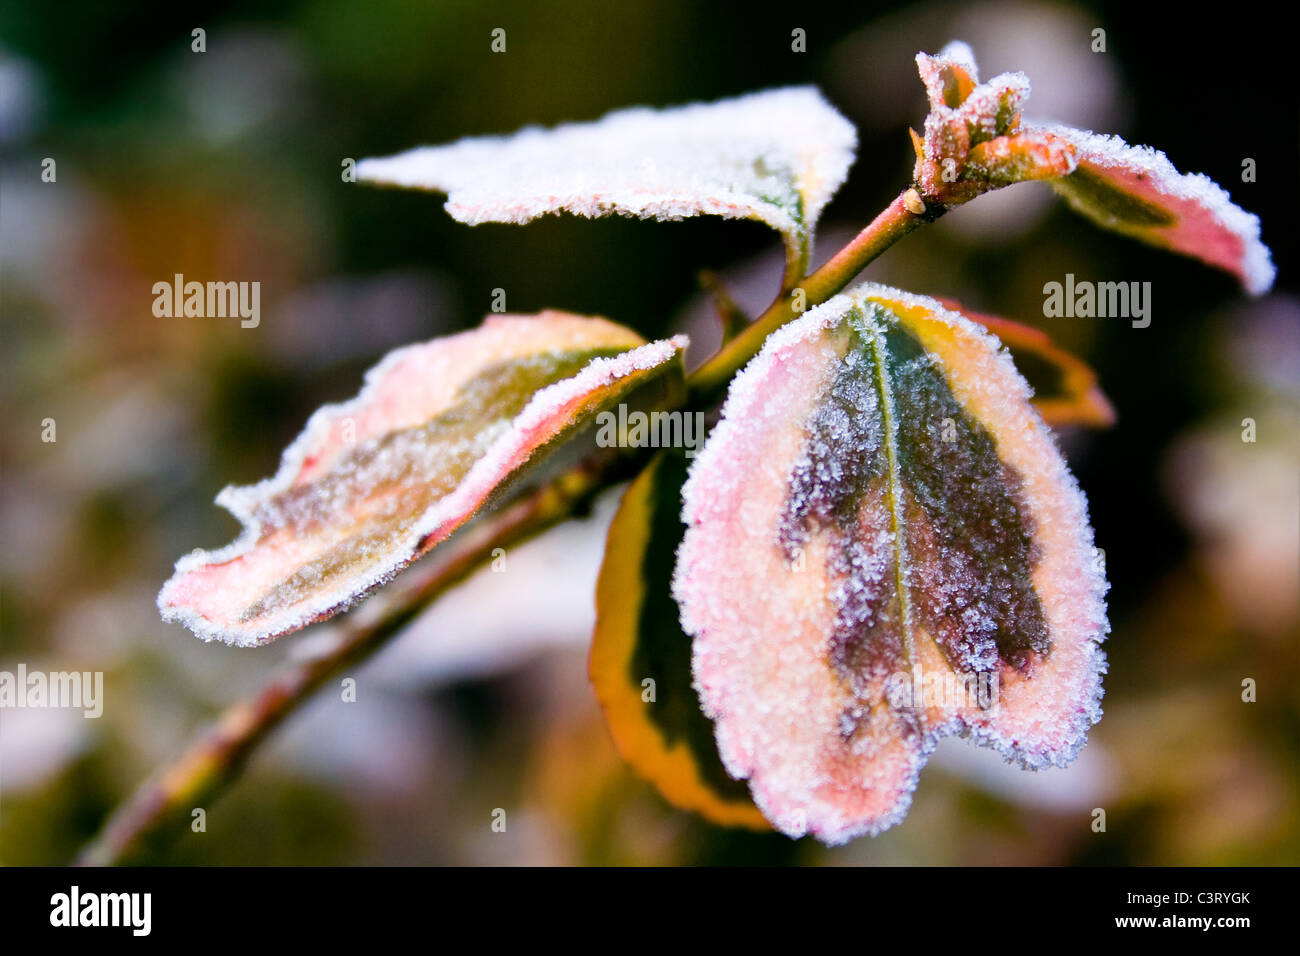 Iced Shrub - Stock Image